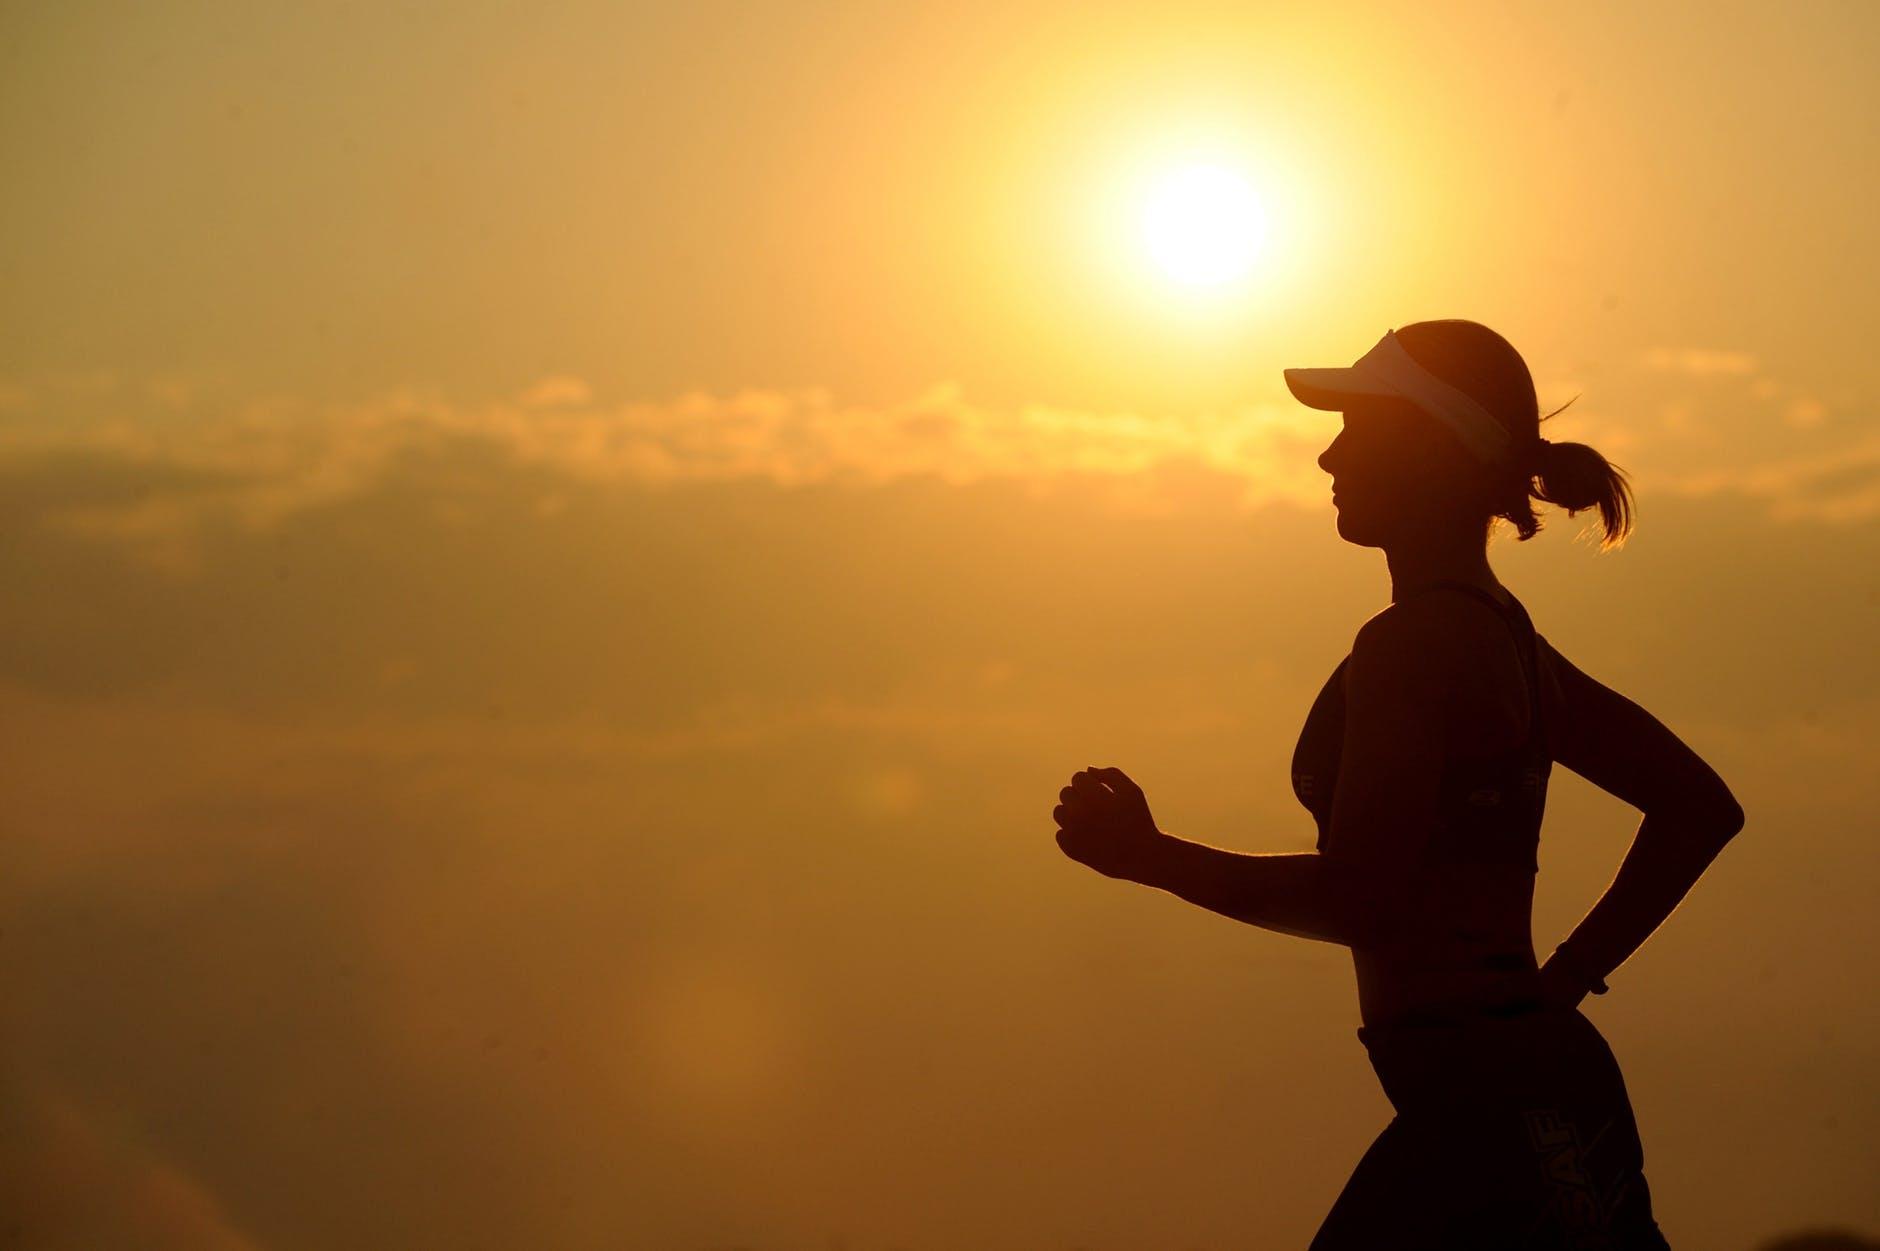 woman with white sunvisor running